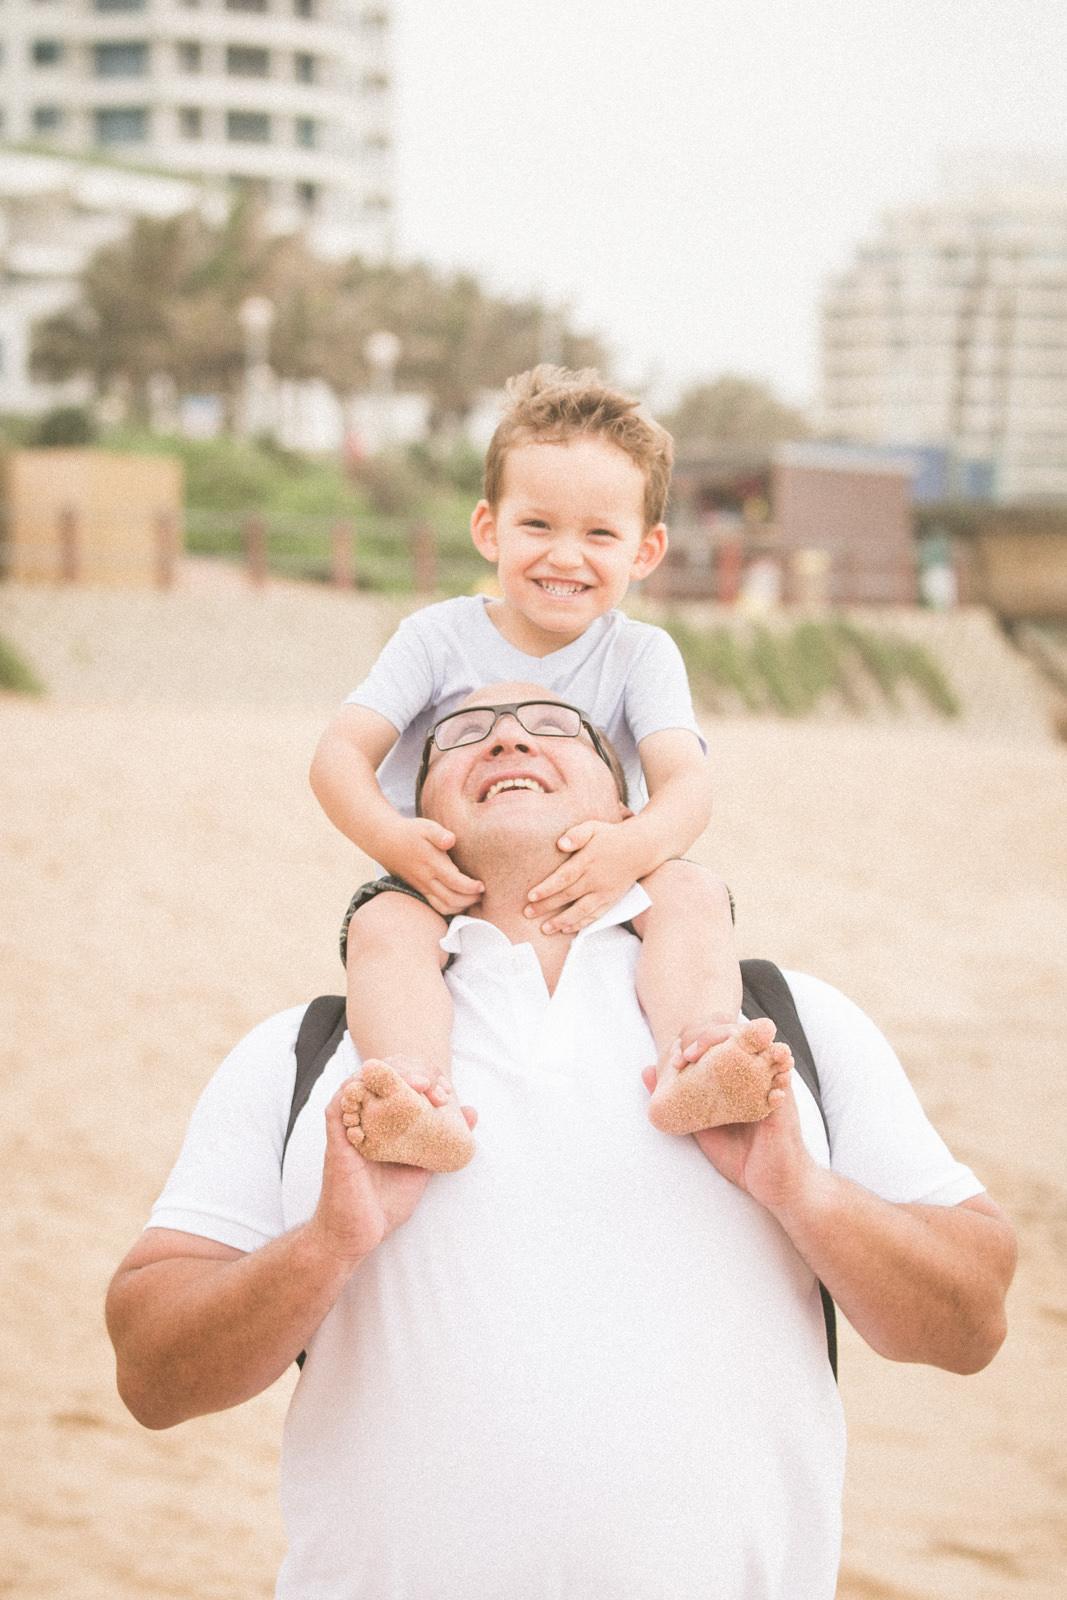 Family photography umhlanga beach rbadal photography dad and son